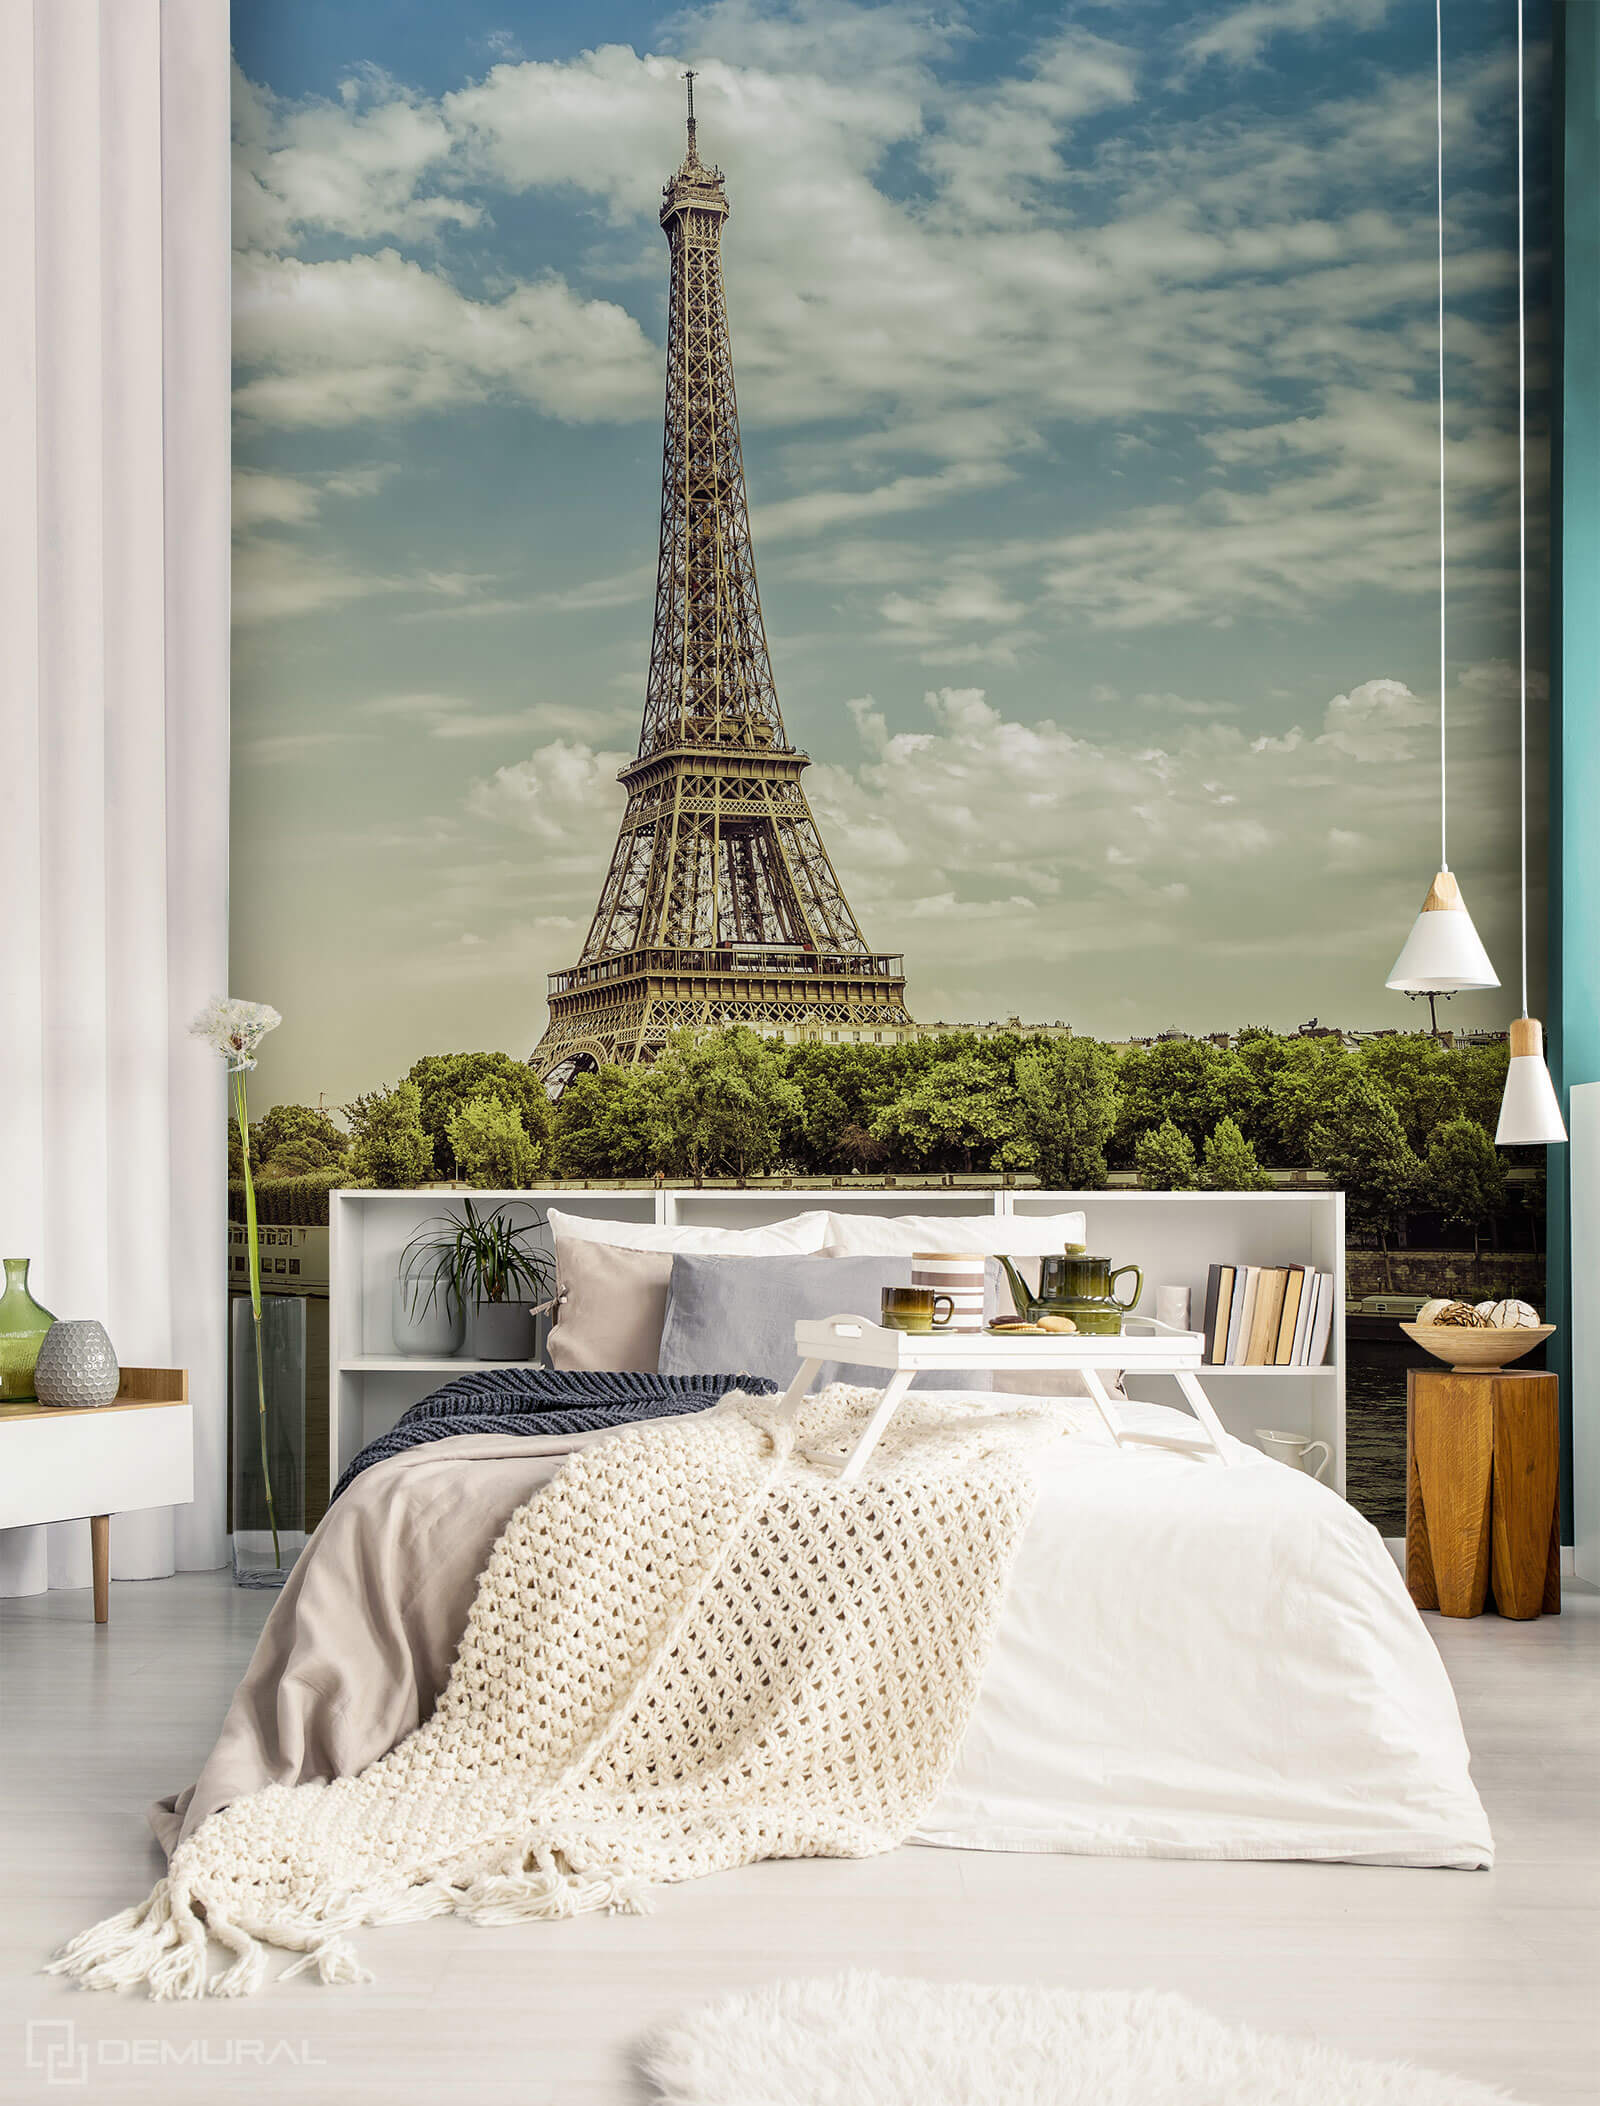 Photo wallpaper Dream over the Seine - photo wallpaper Eiffel tower - Demural